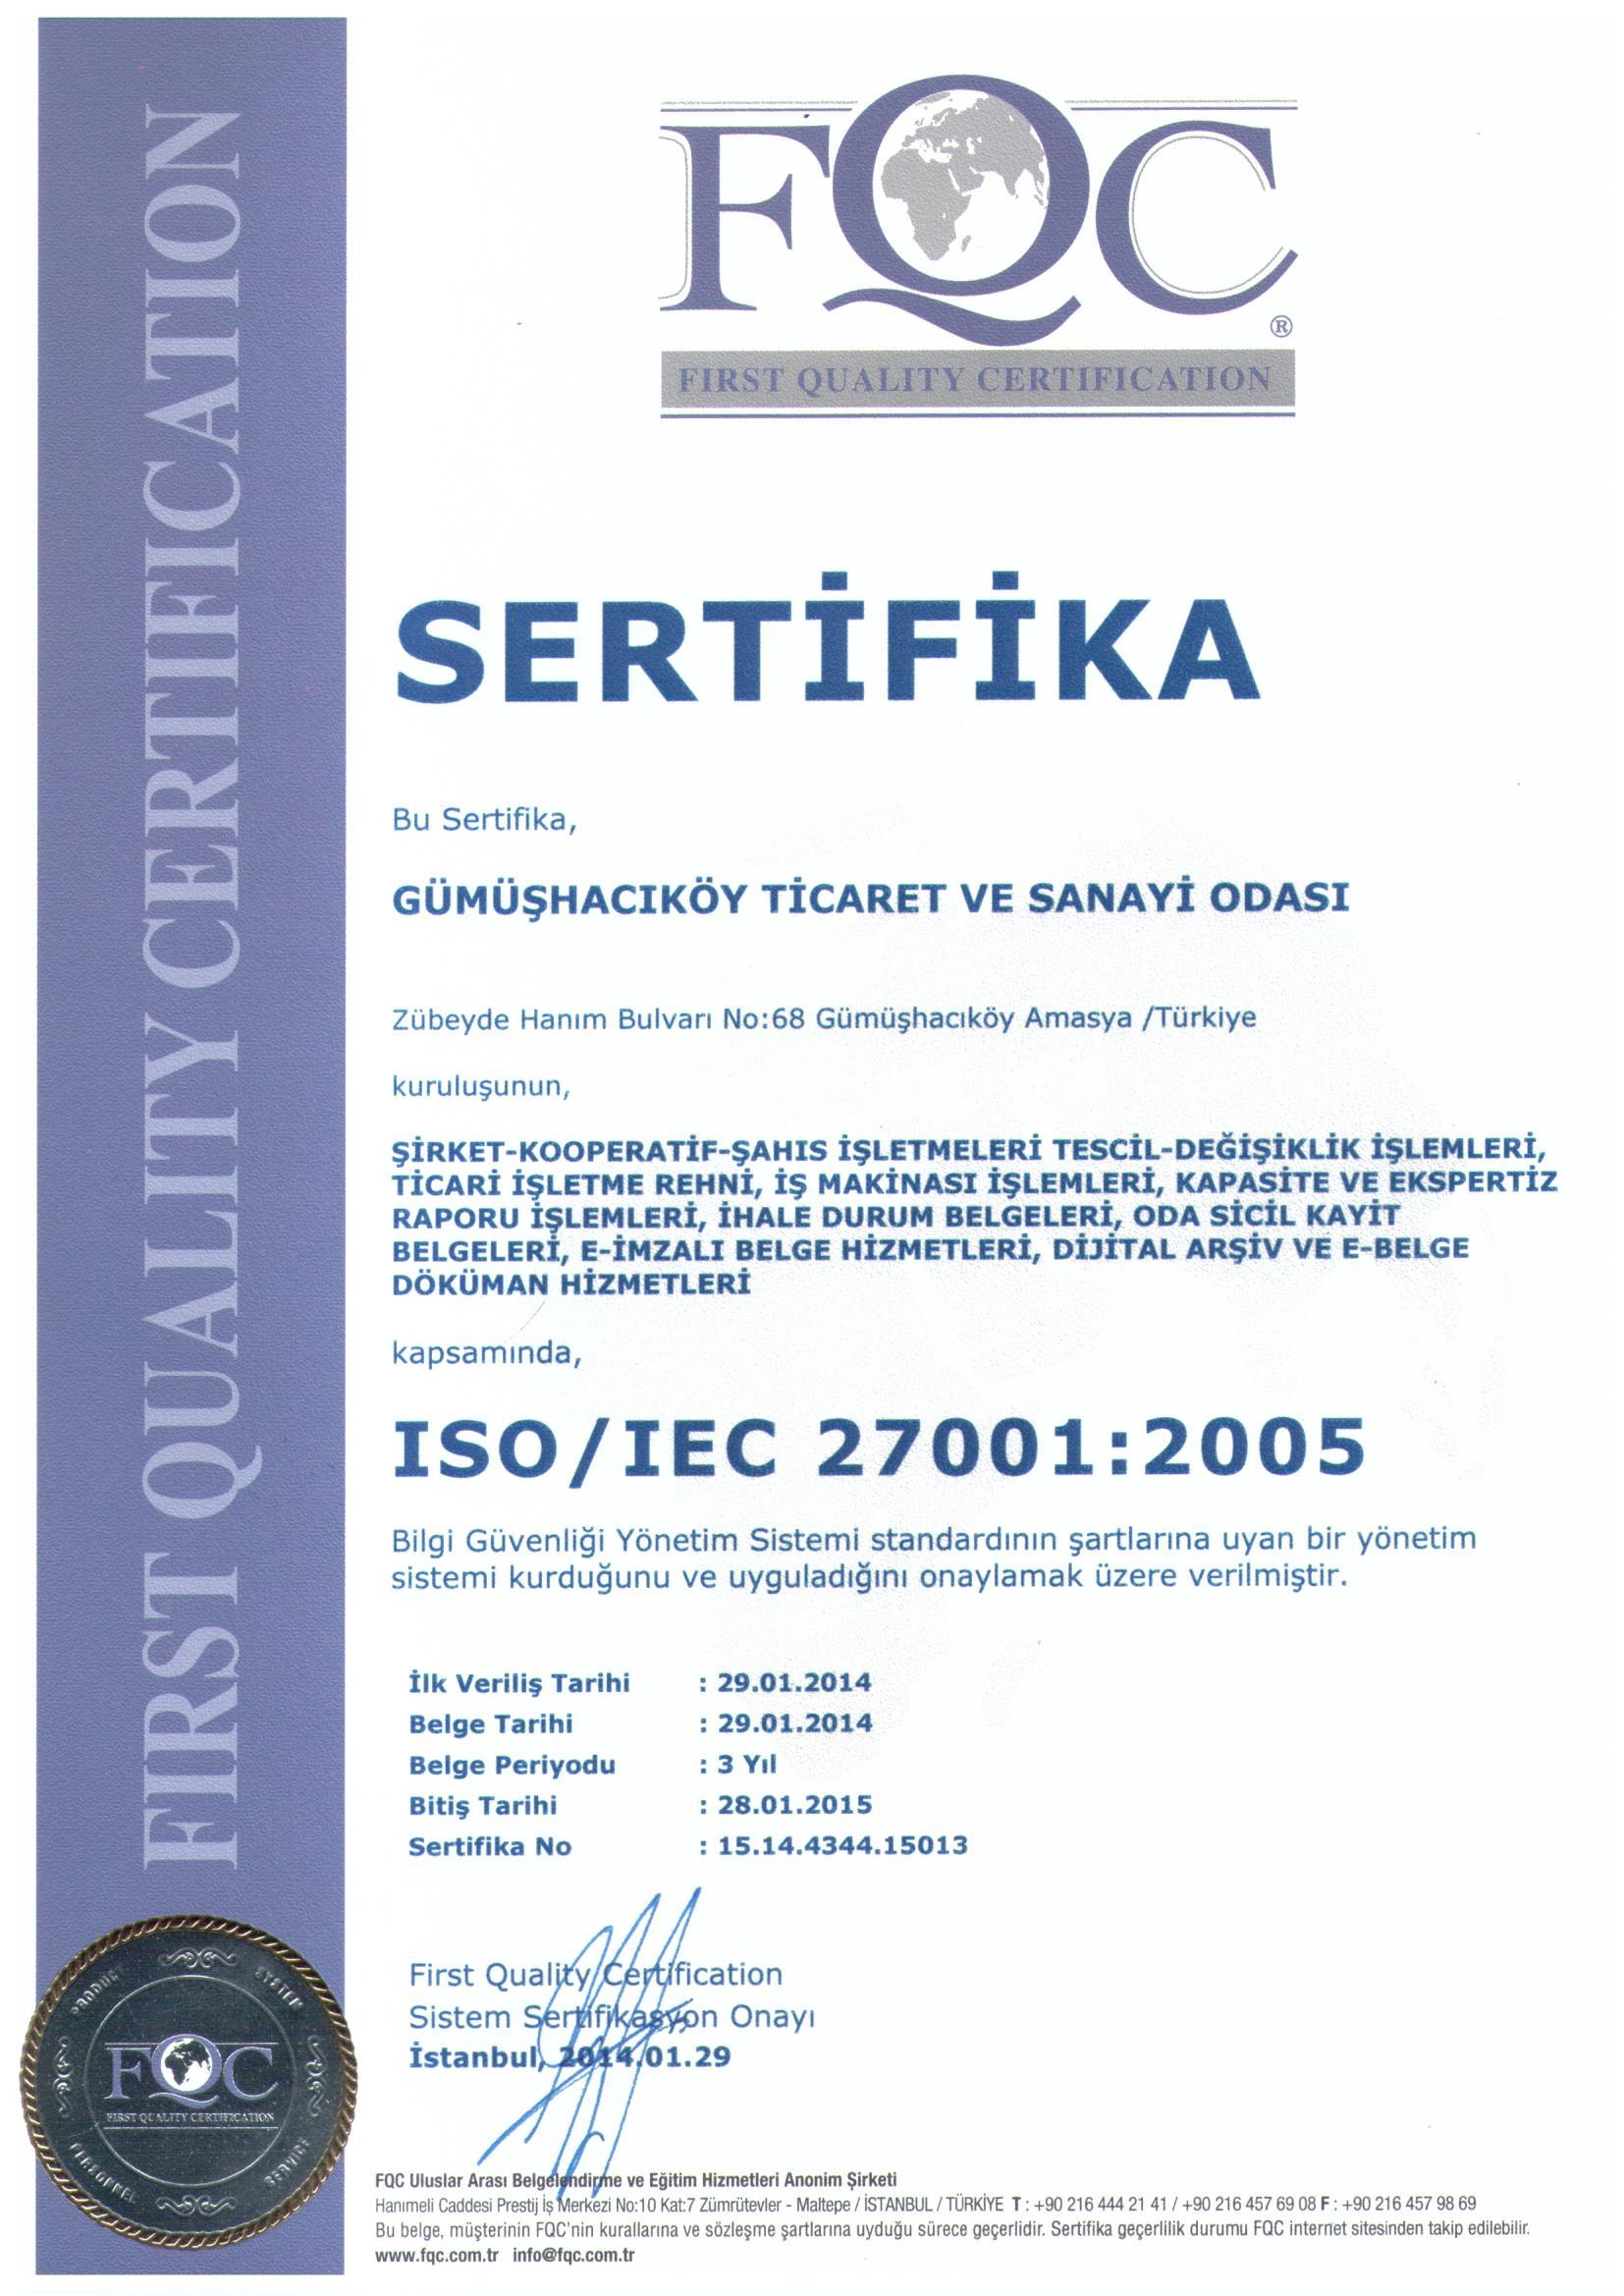 GÜMÜŞHACIKÖY TSO İSO 27001-2005 BELGESİ